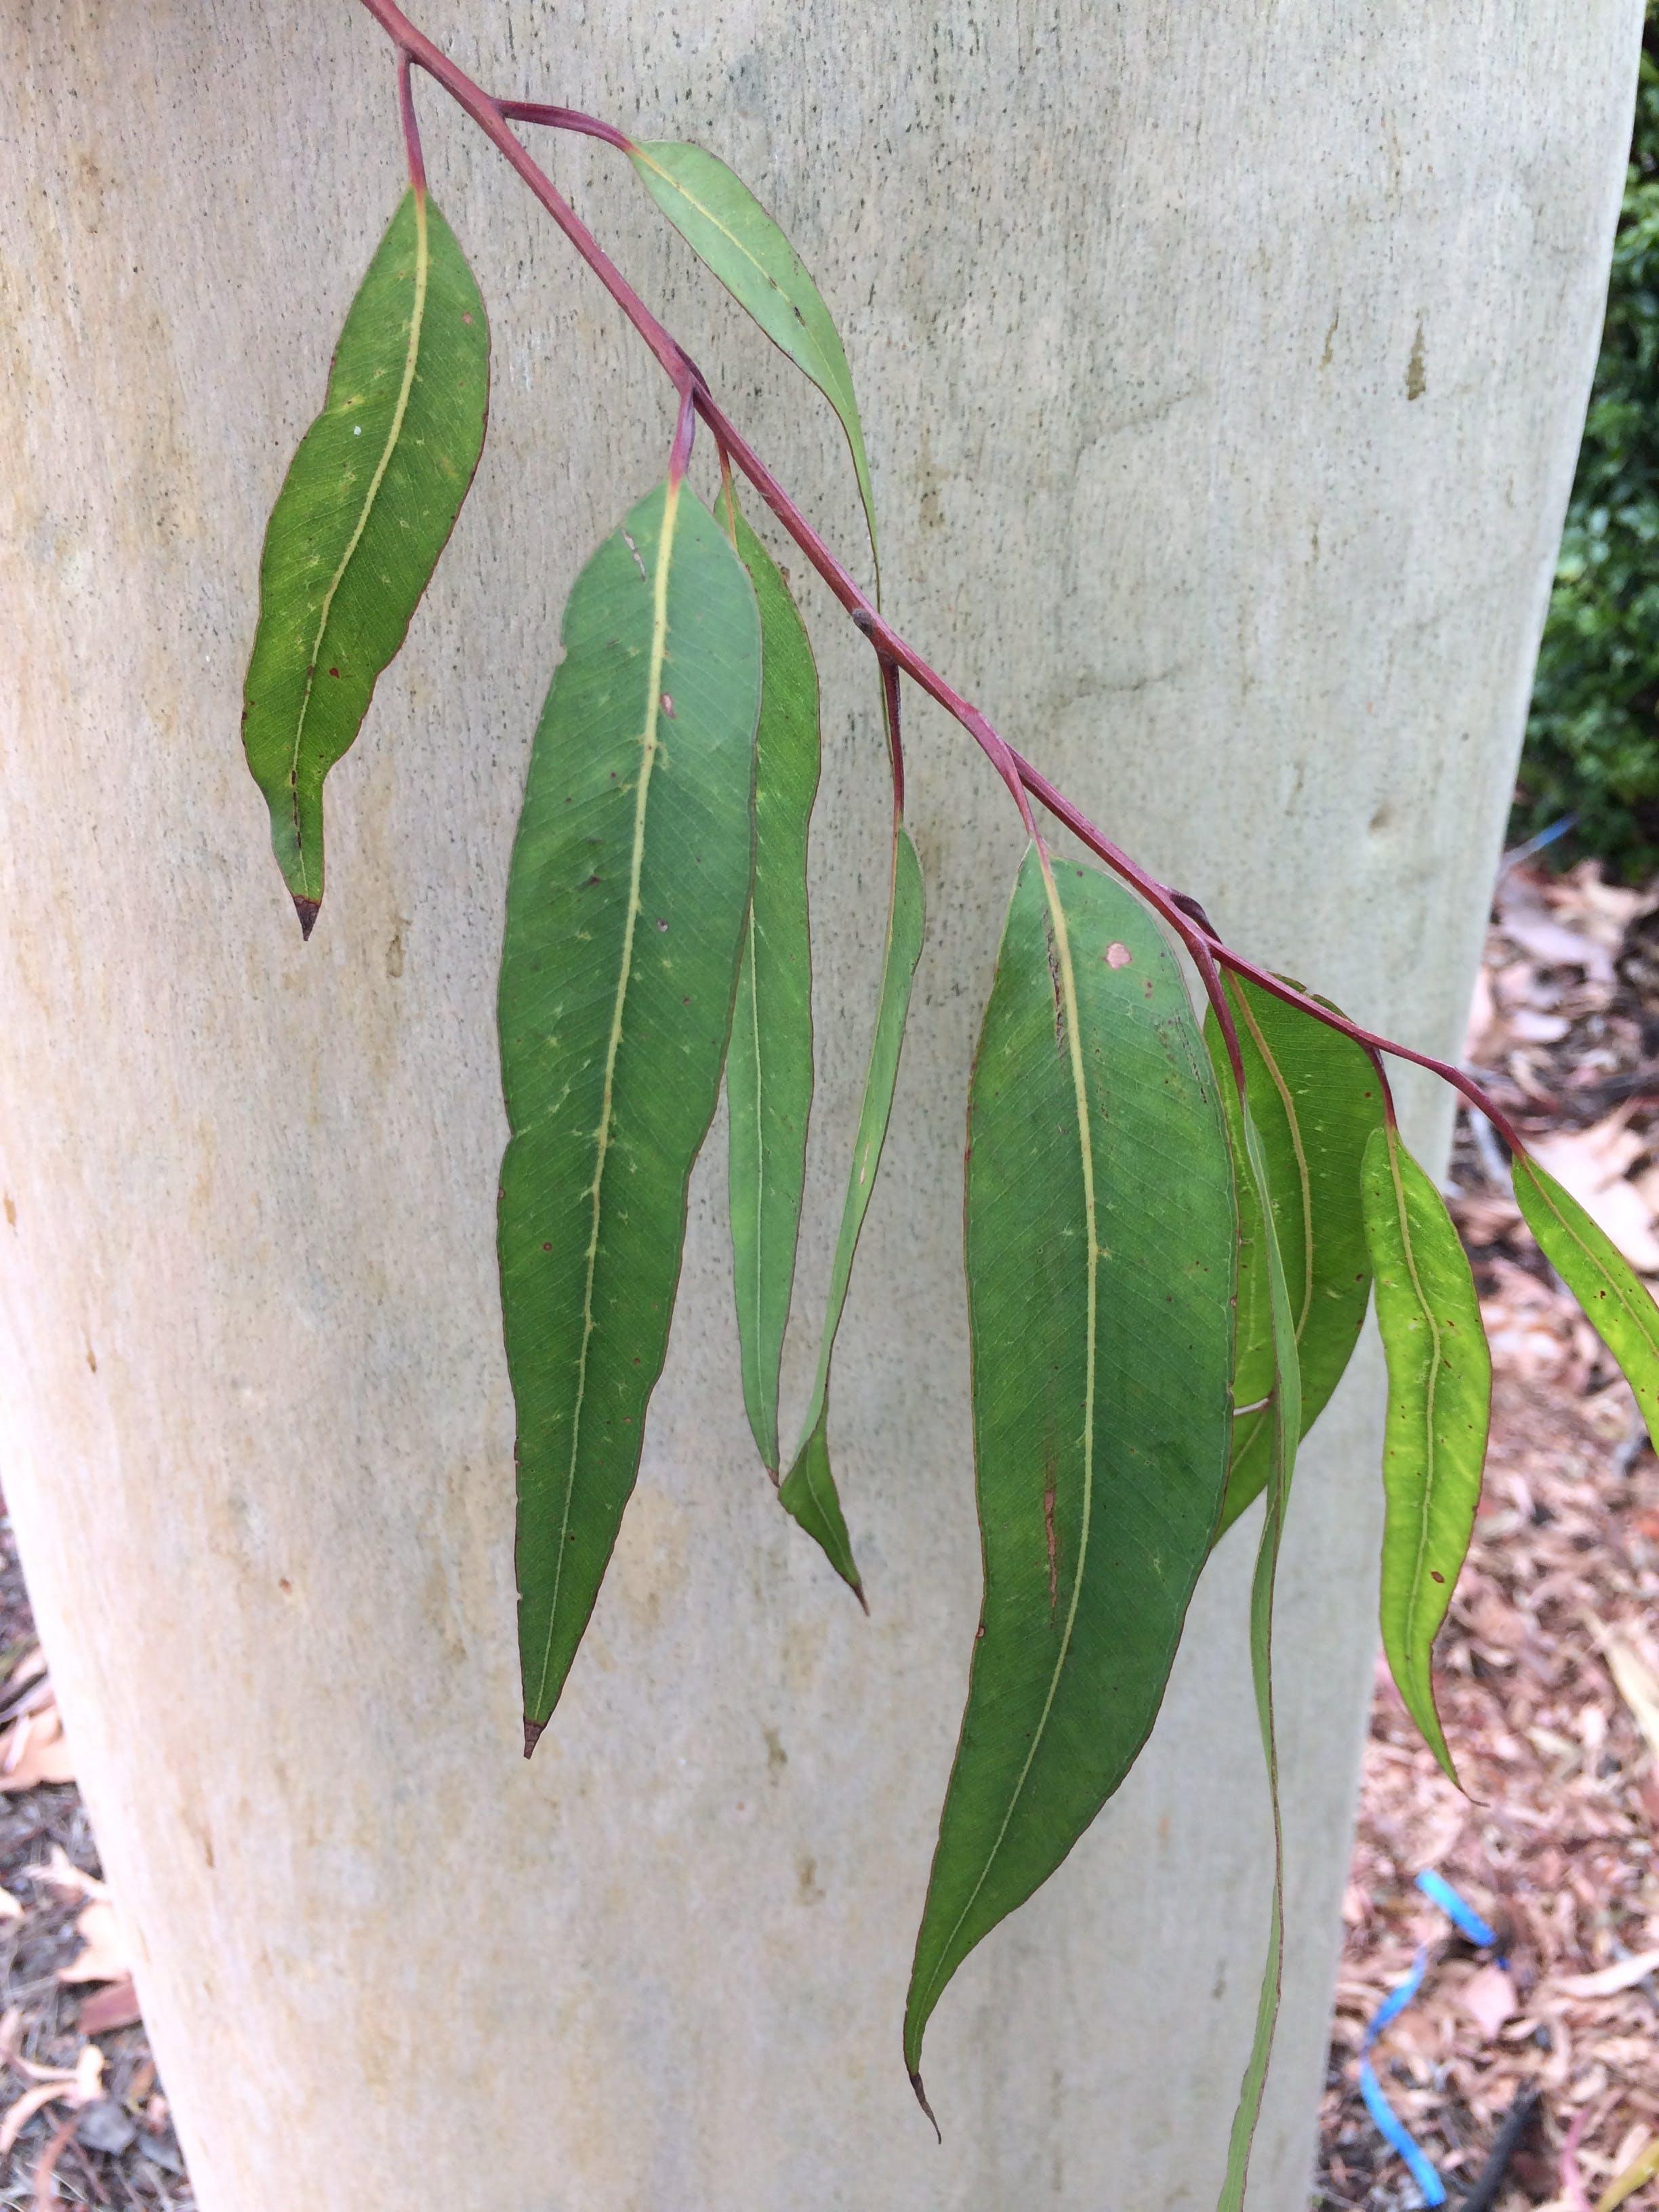 Gum Trees located on Welshpool Road East